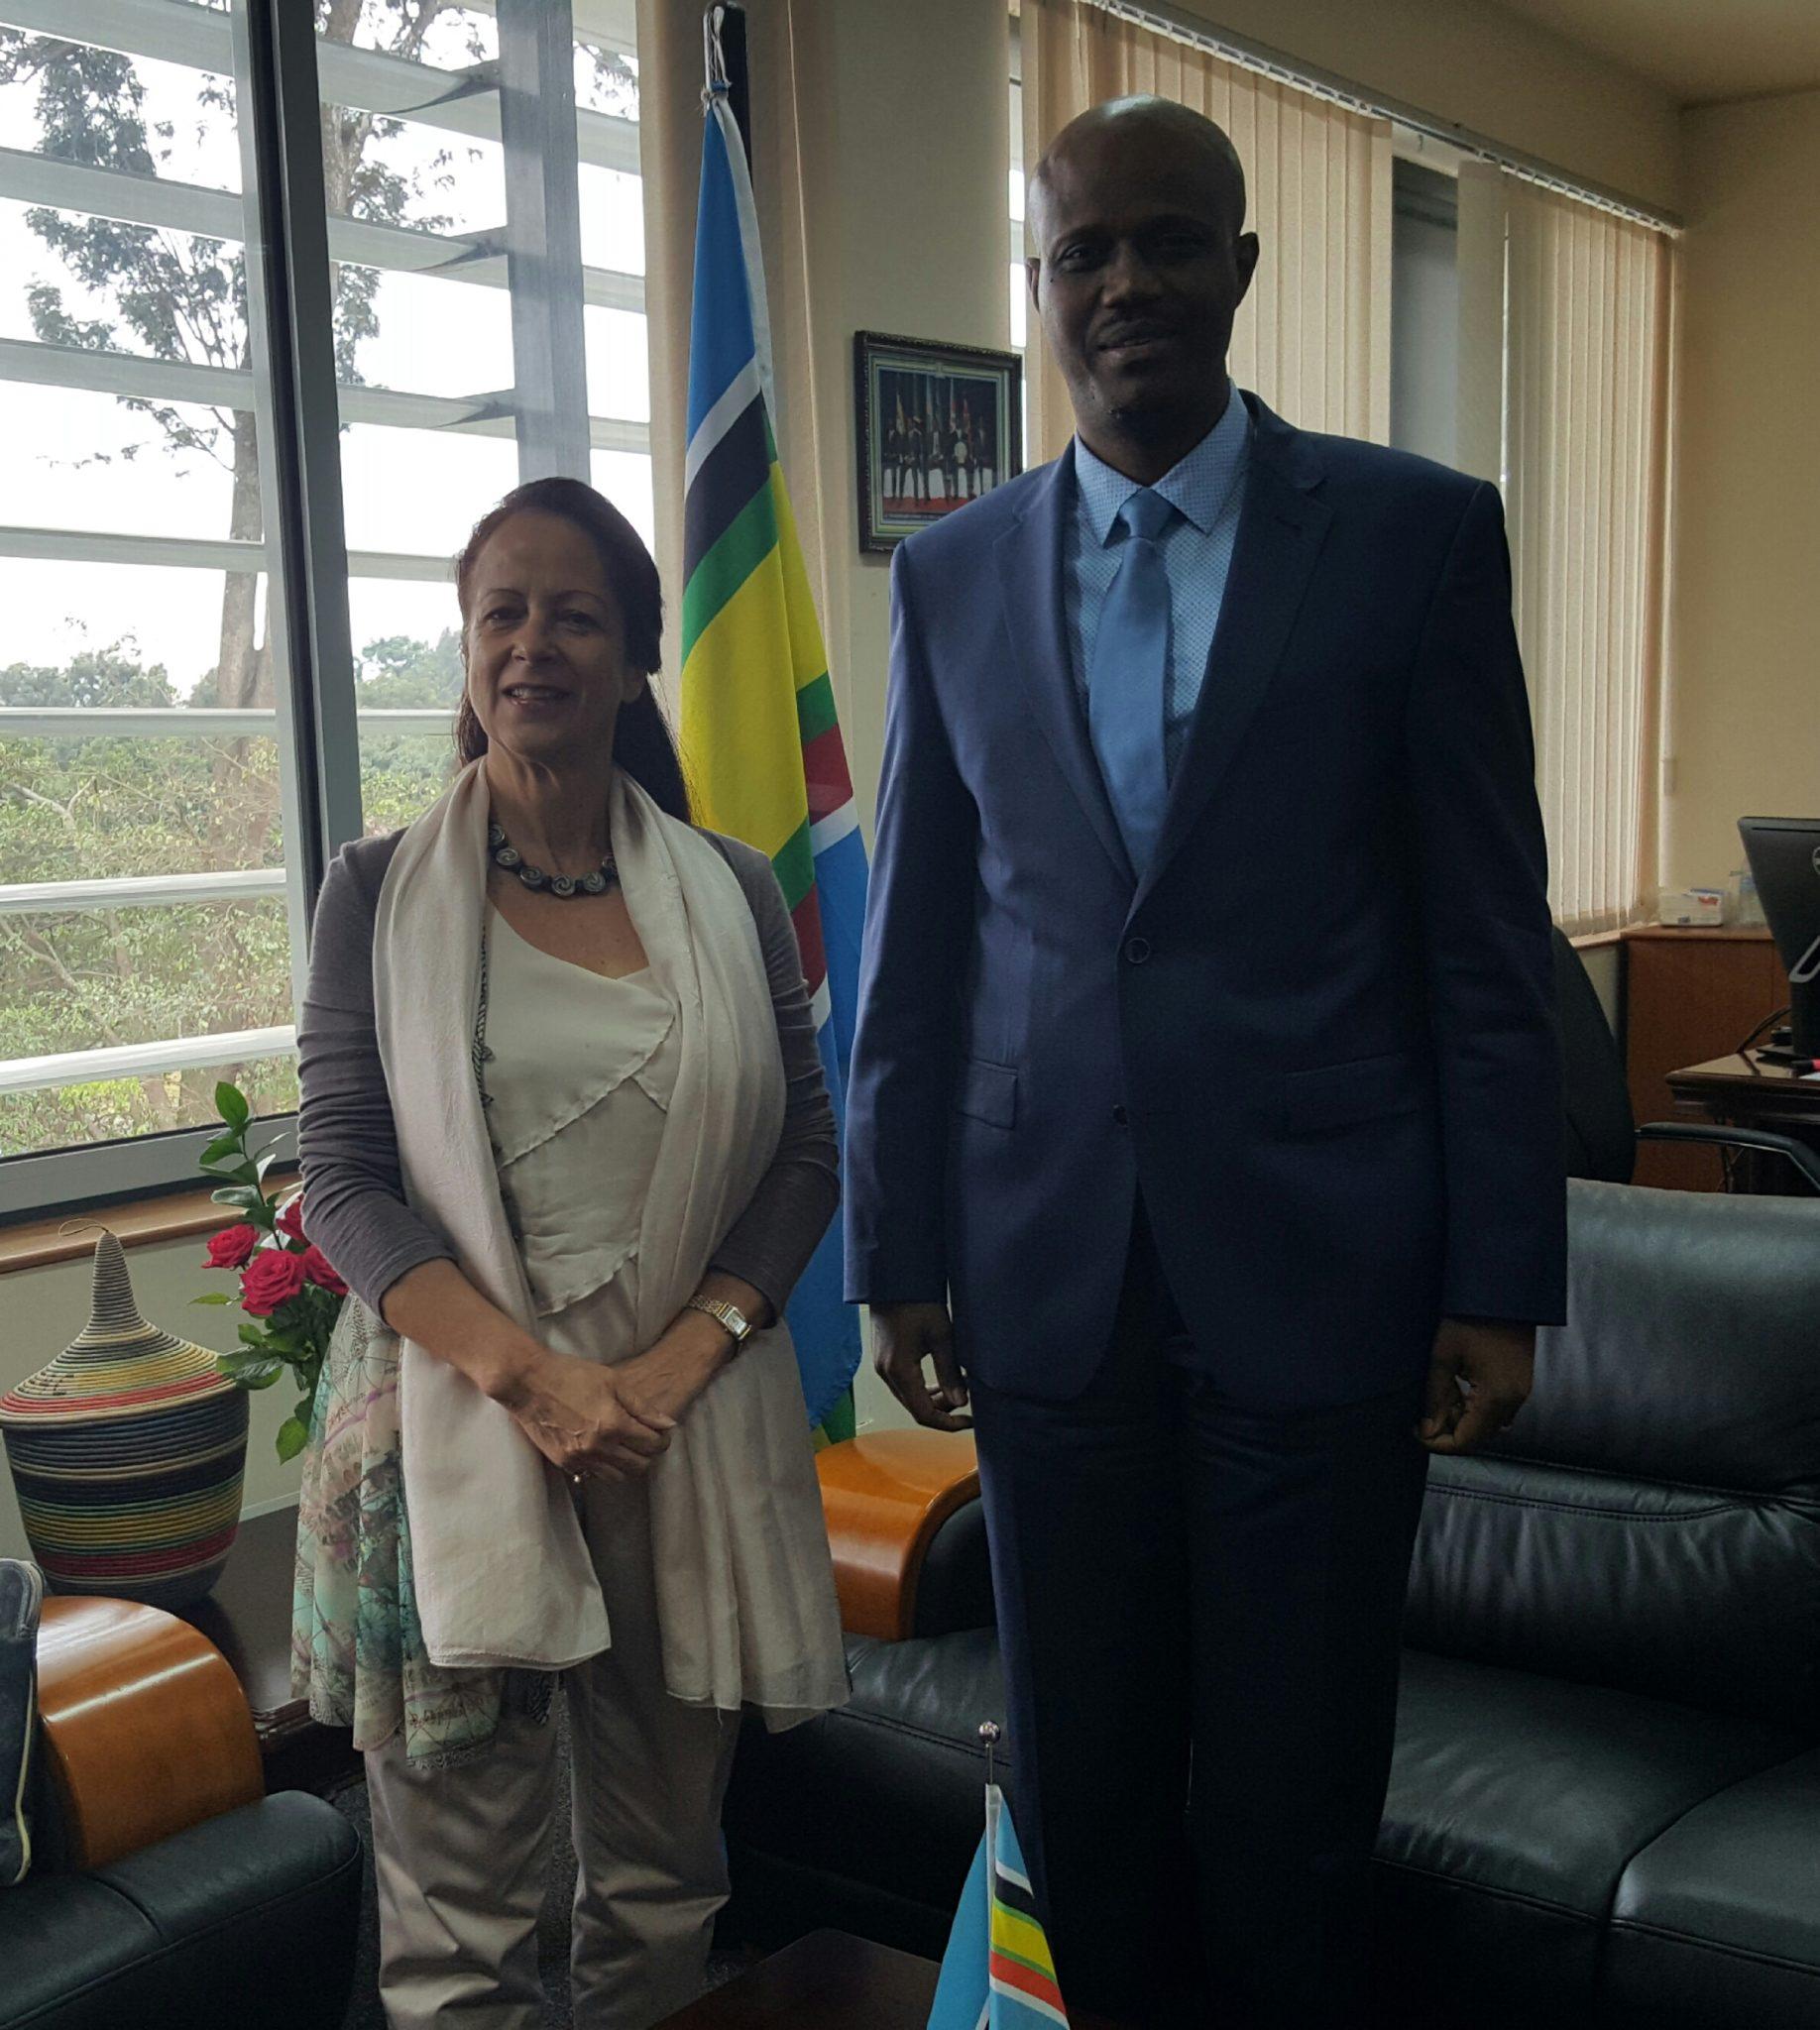 EAC Secretary General Amb Liberat Mfumukeko with French Ambassador, Ms Malika Berak, at the EAC Headquarters.